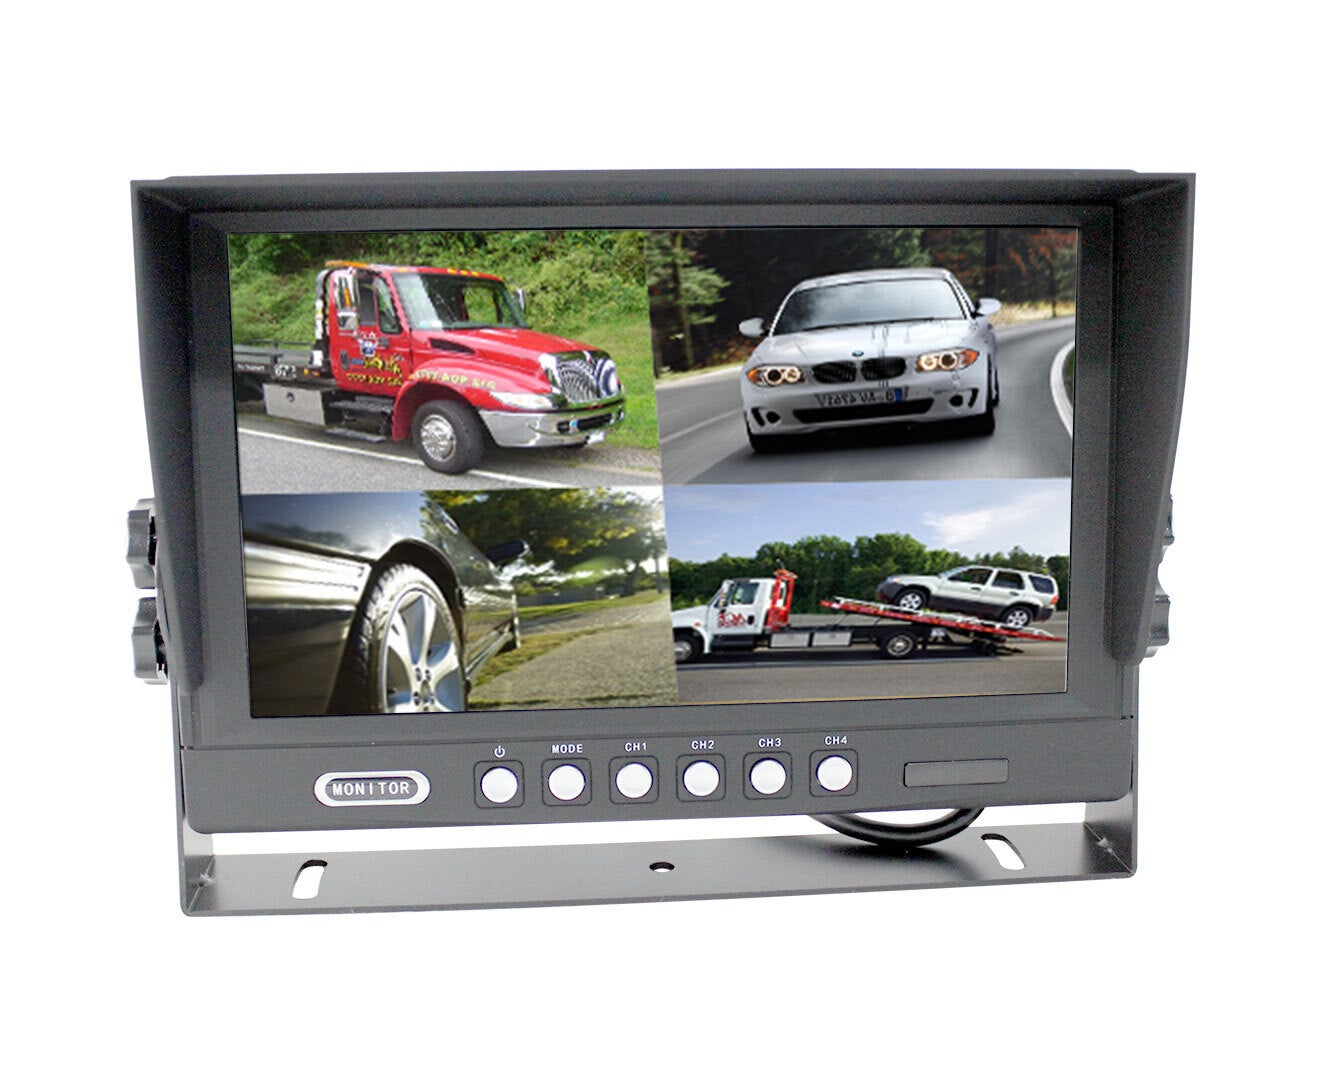 "Elinz 9"" Splitscreen Monitor 4PIN Rearview 12V/24V Sunshade 4 AV Inputs 800x480"